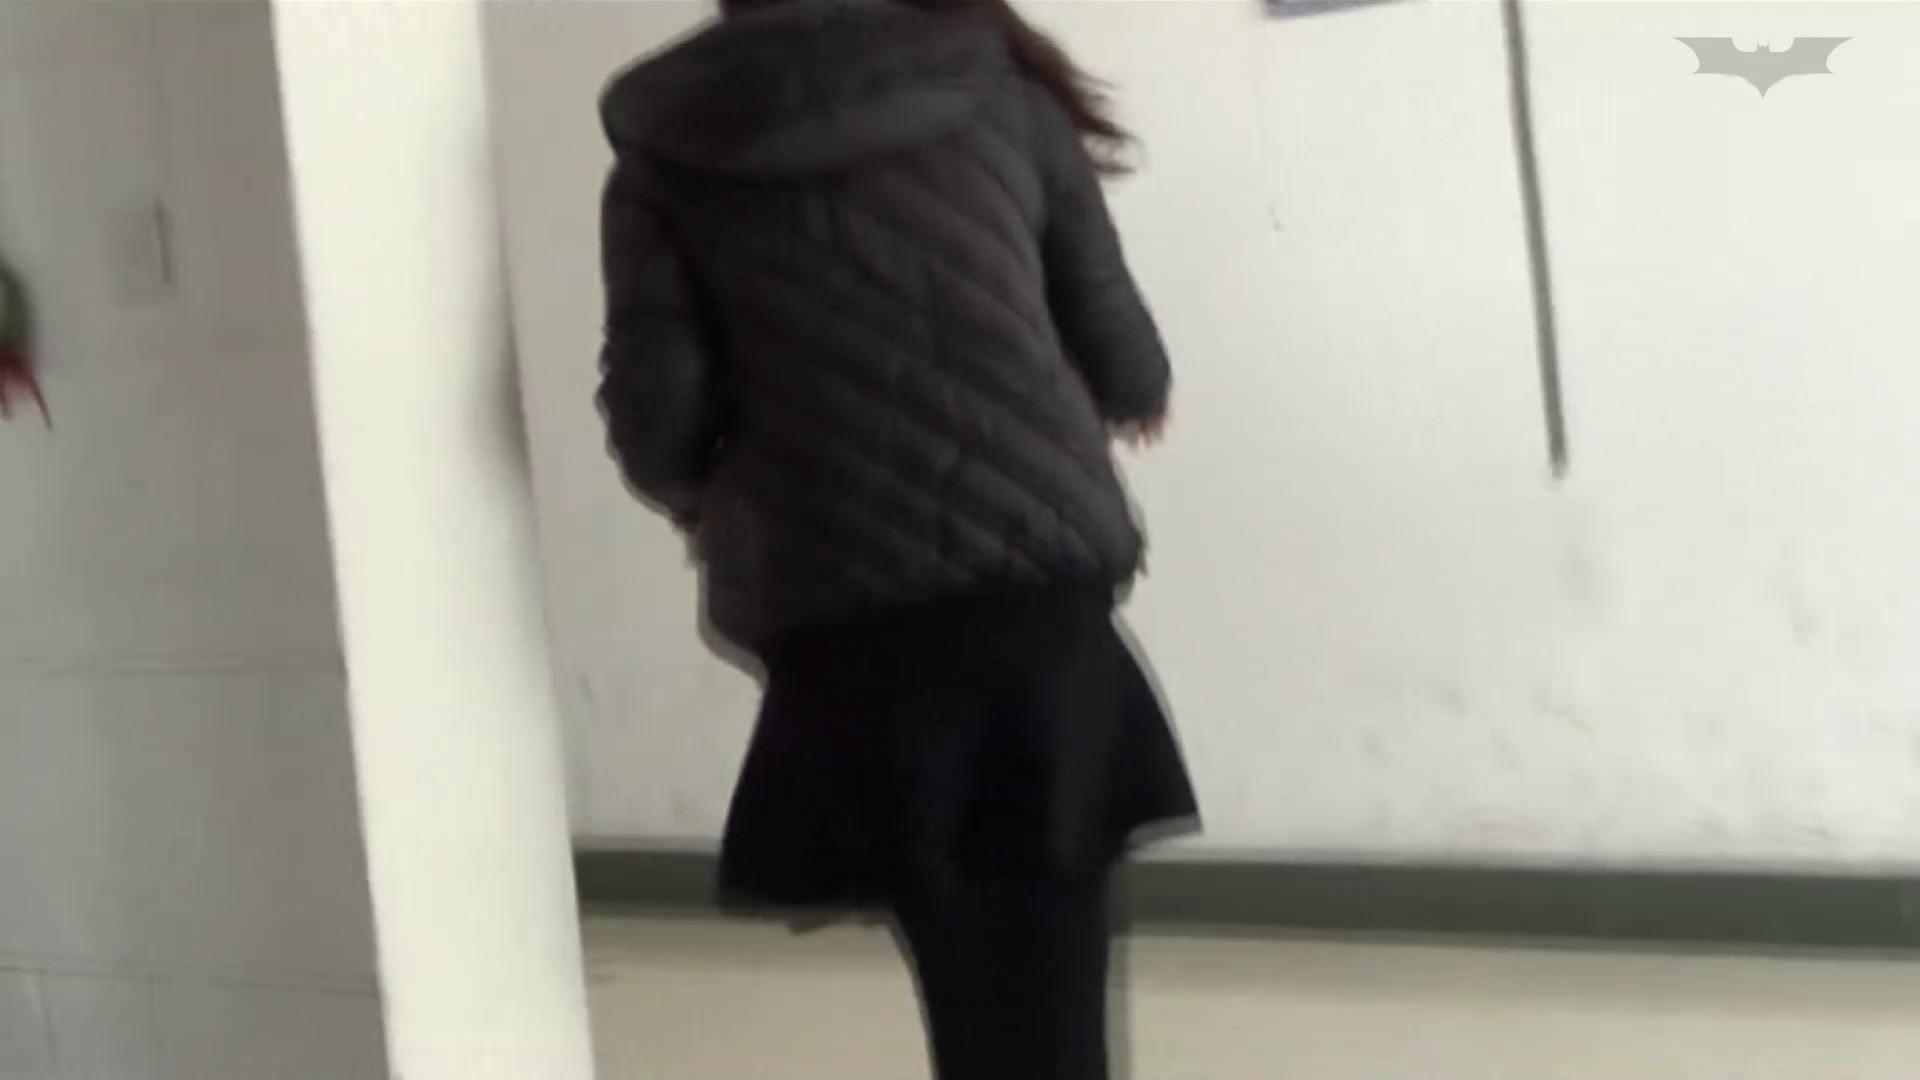 JD盗撮 美女の洗面所の秘密 Vol.46 美女 AV無料 99画像 31